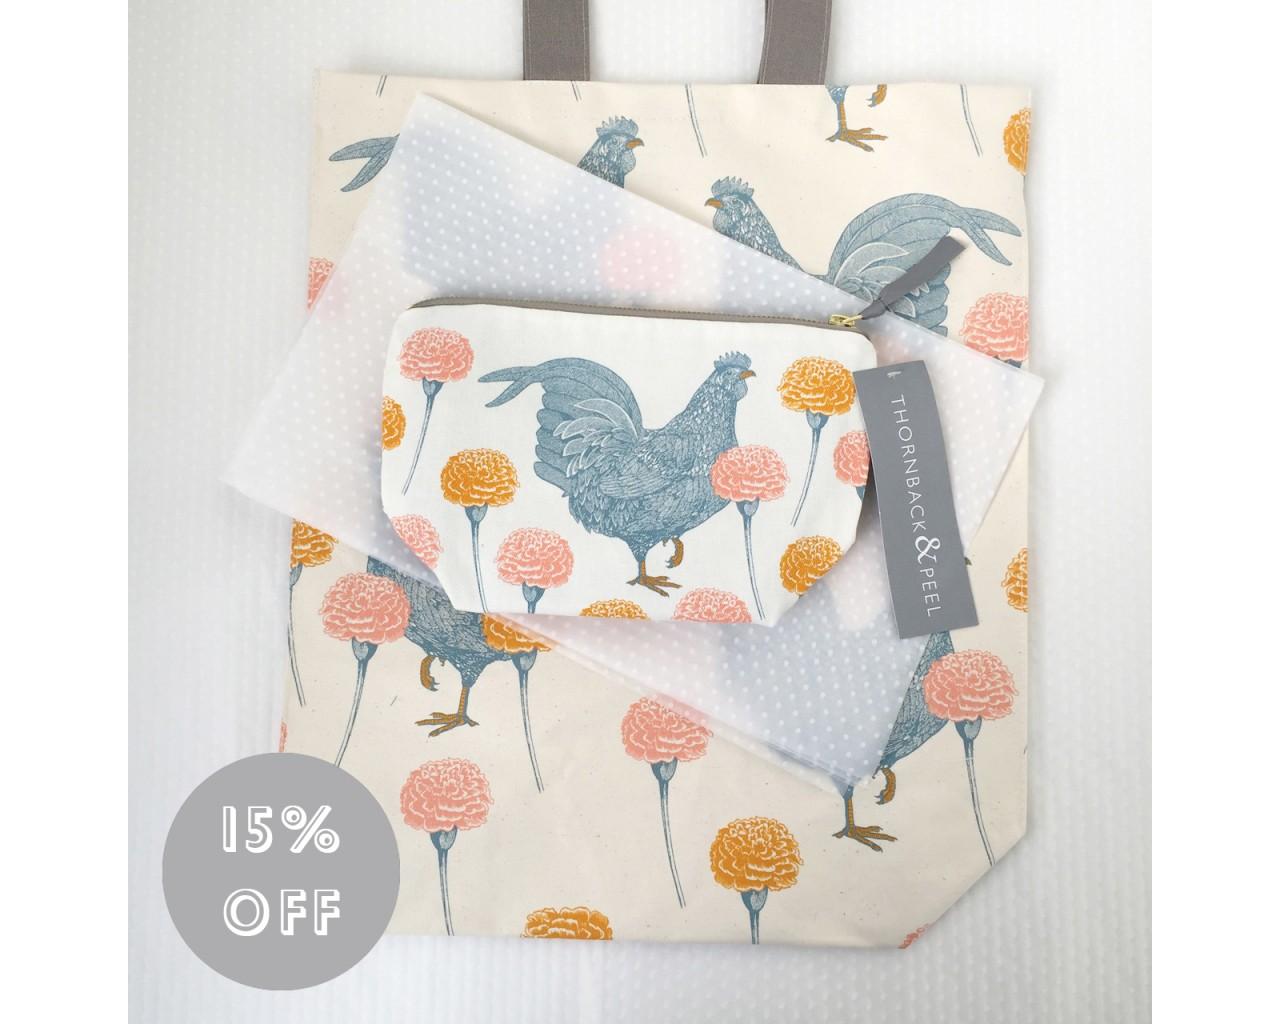 Thornback and Peel chicken-carnation-bag-gift-set